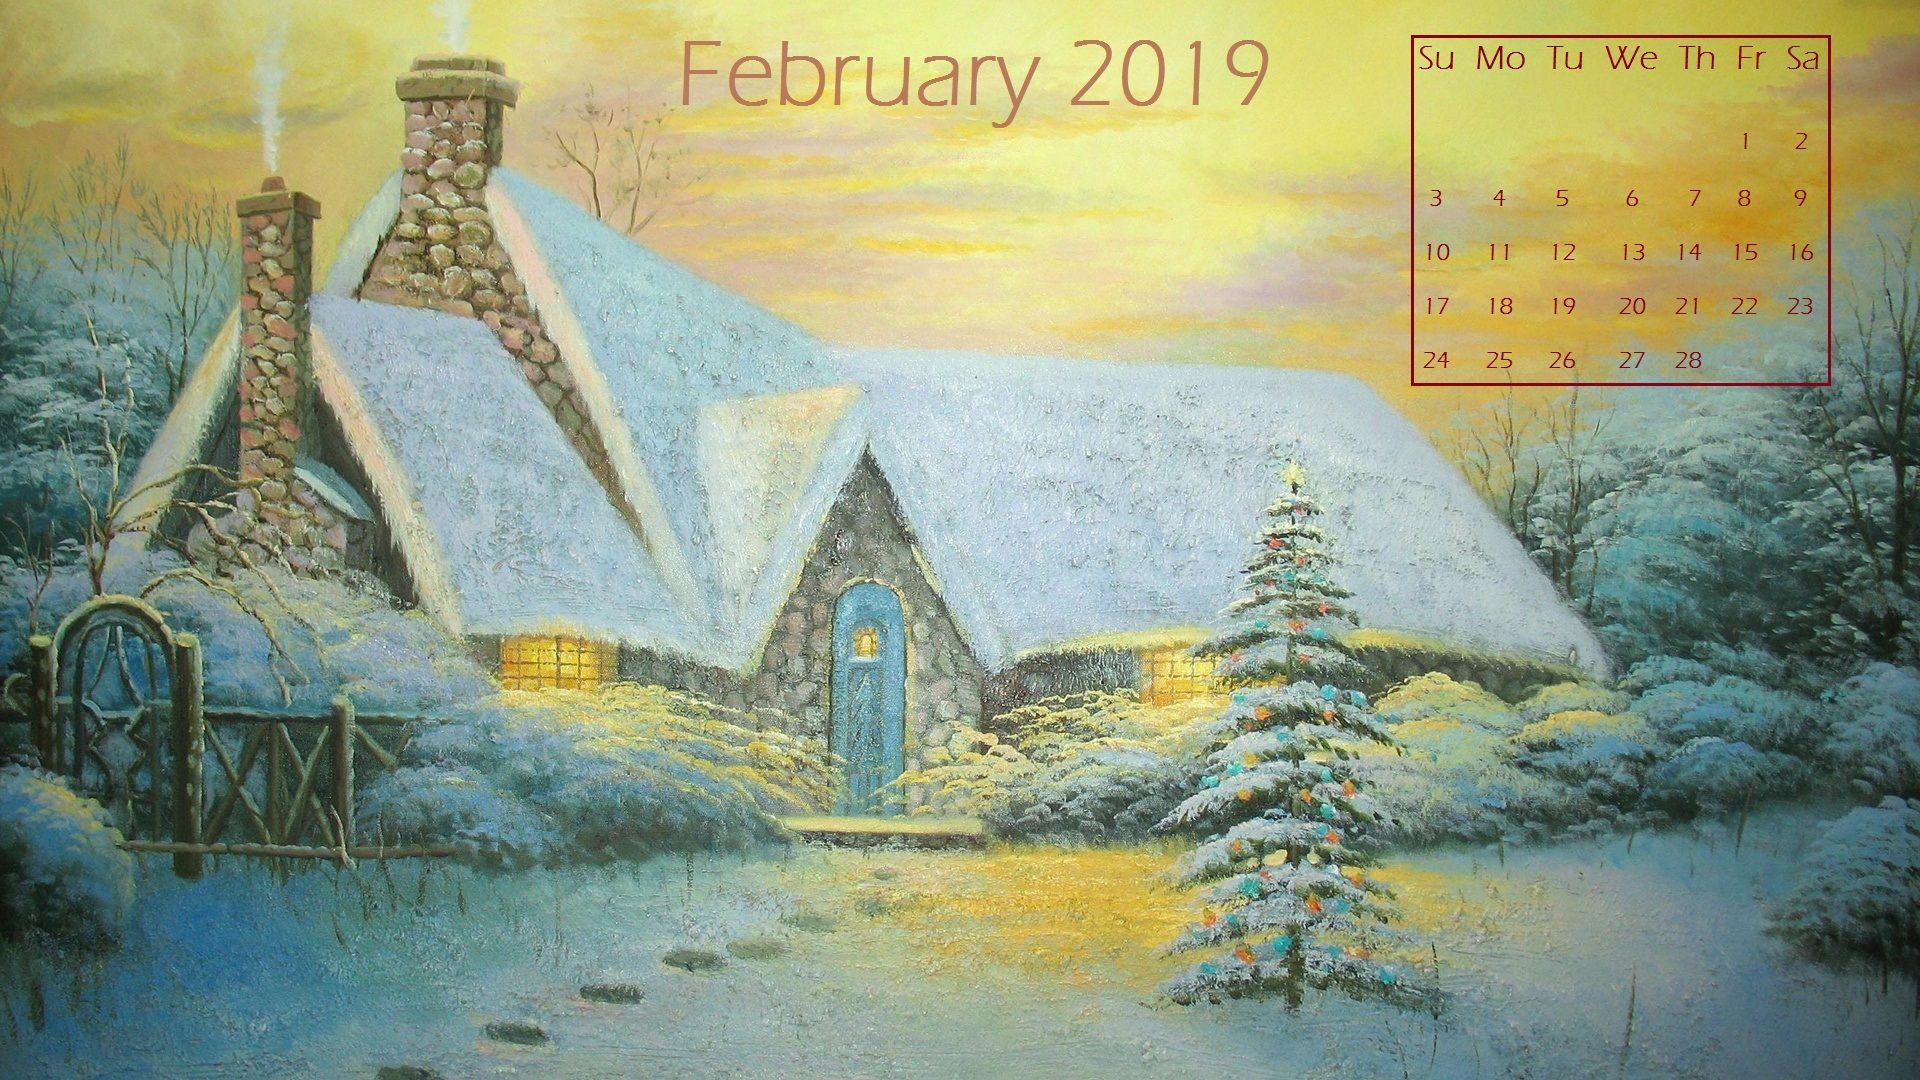 February 2020 Desktop Calendar Wallpaper Kinkade